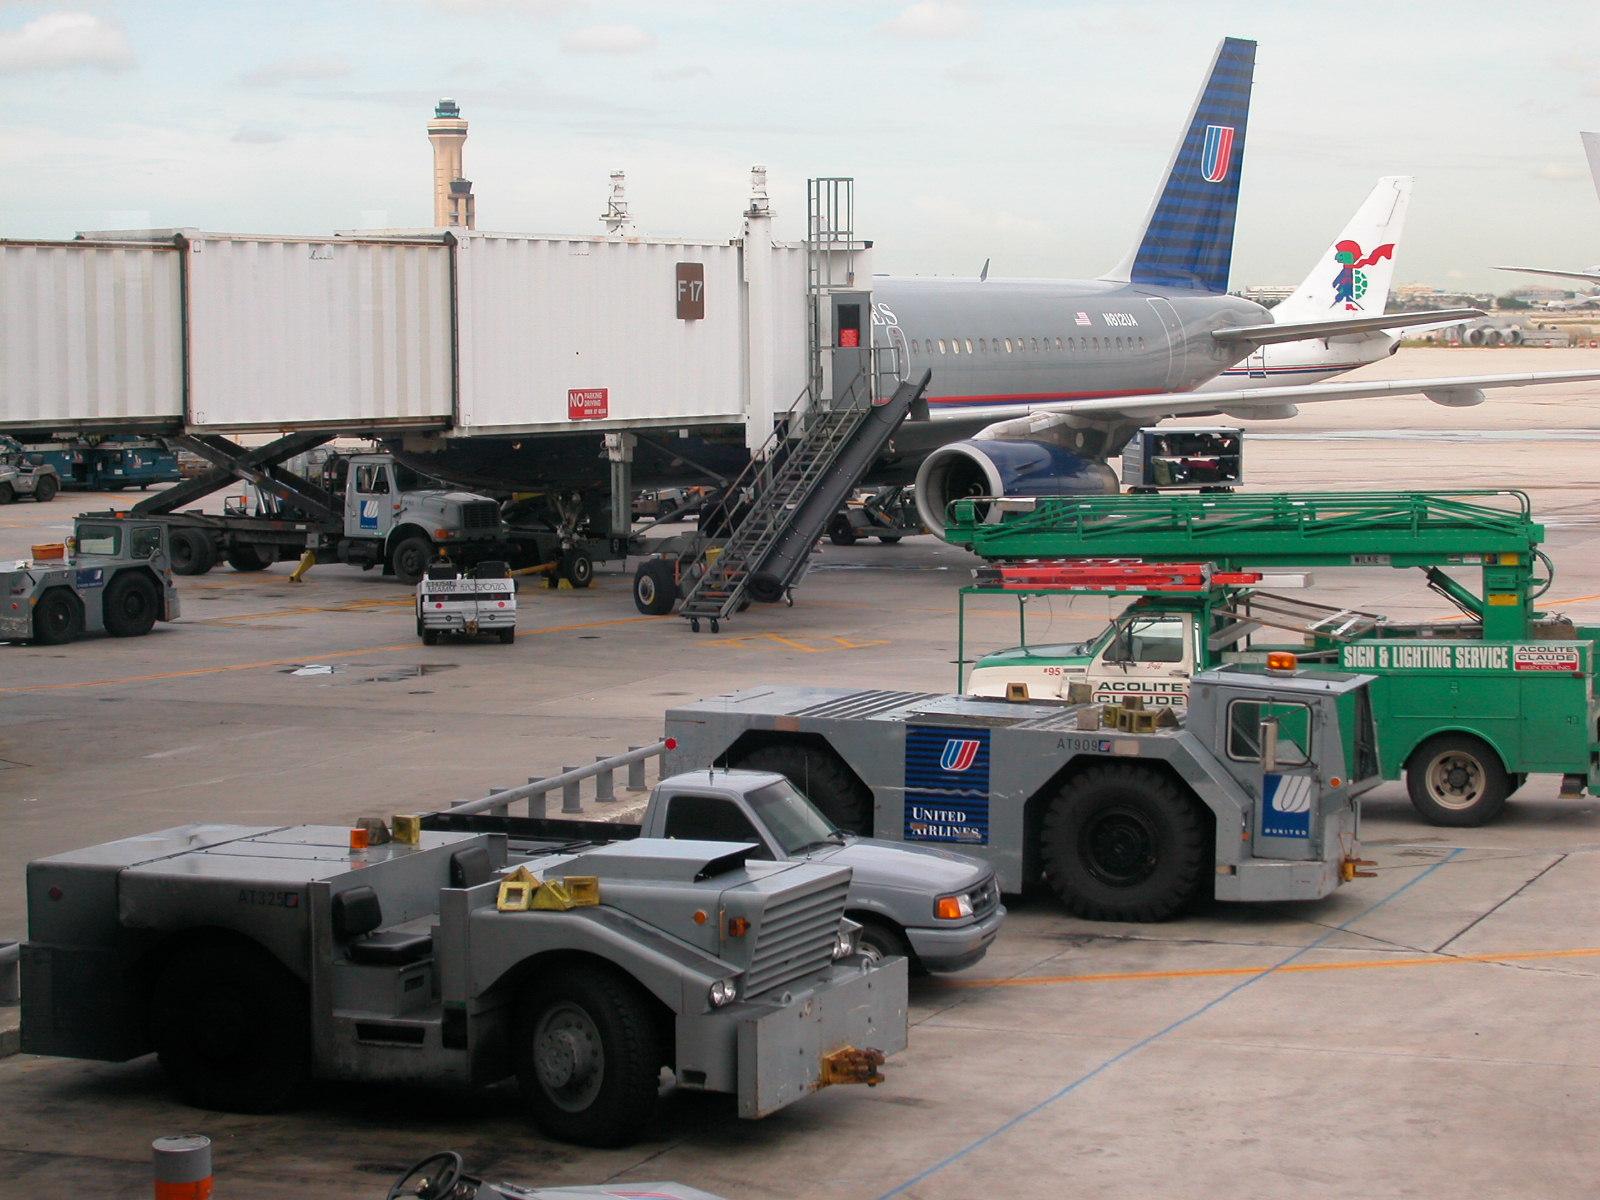 airplane aeroplane vehicles cars loading airport